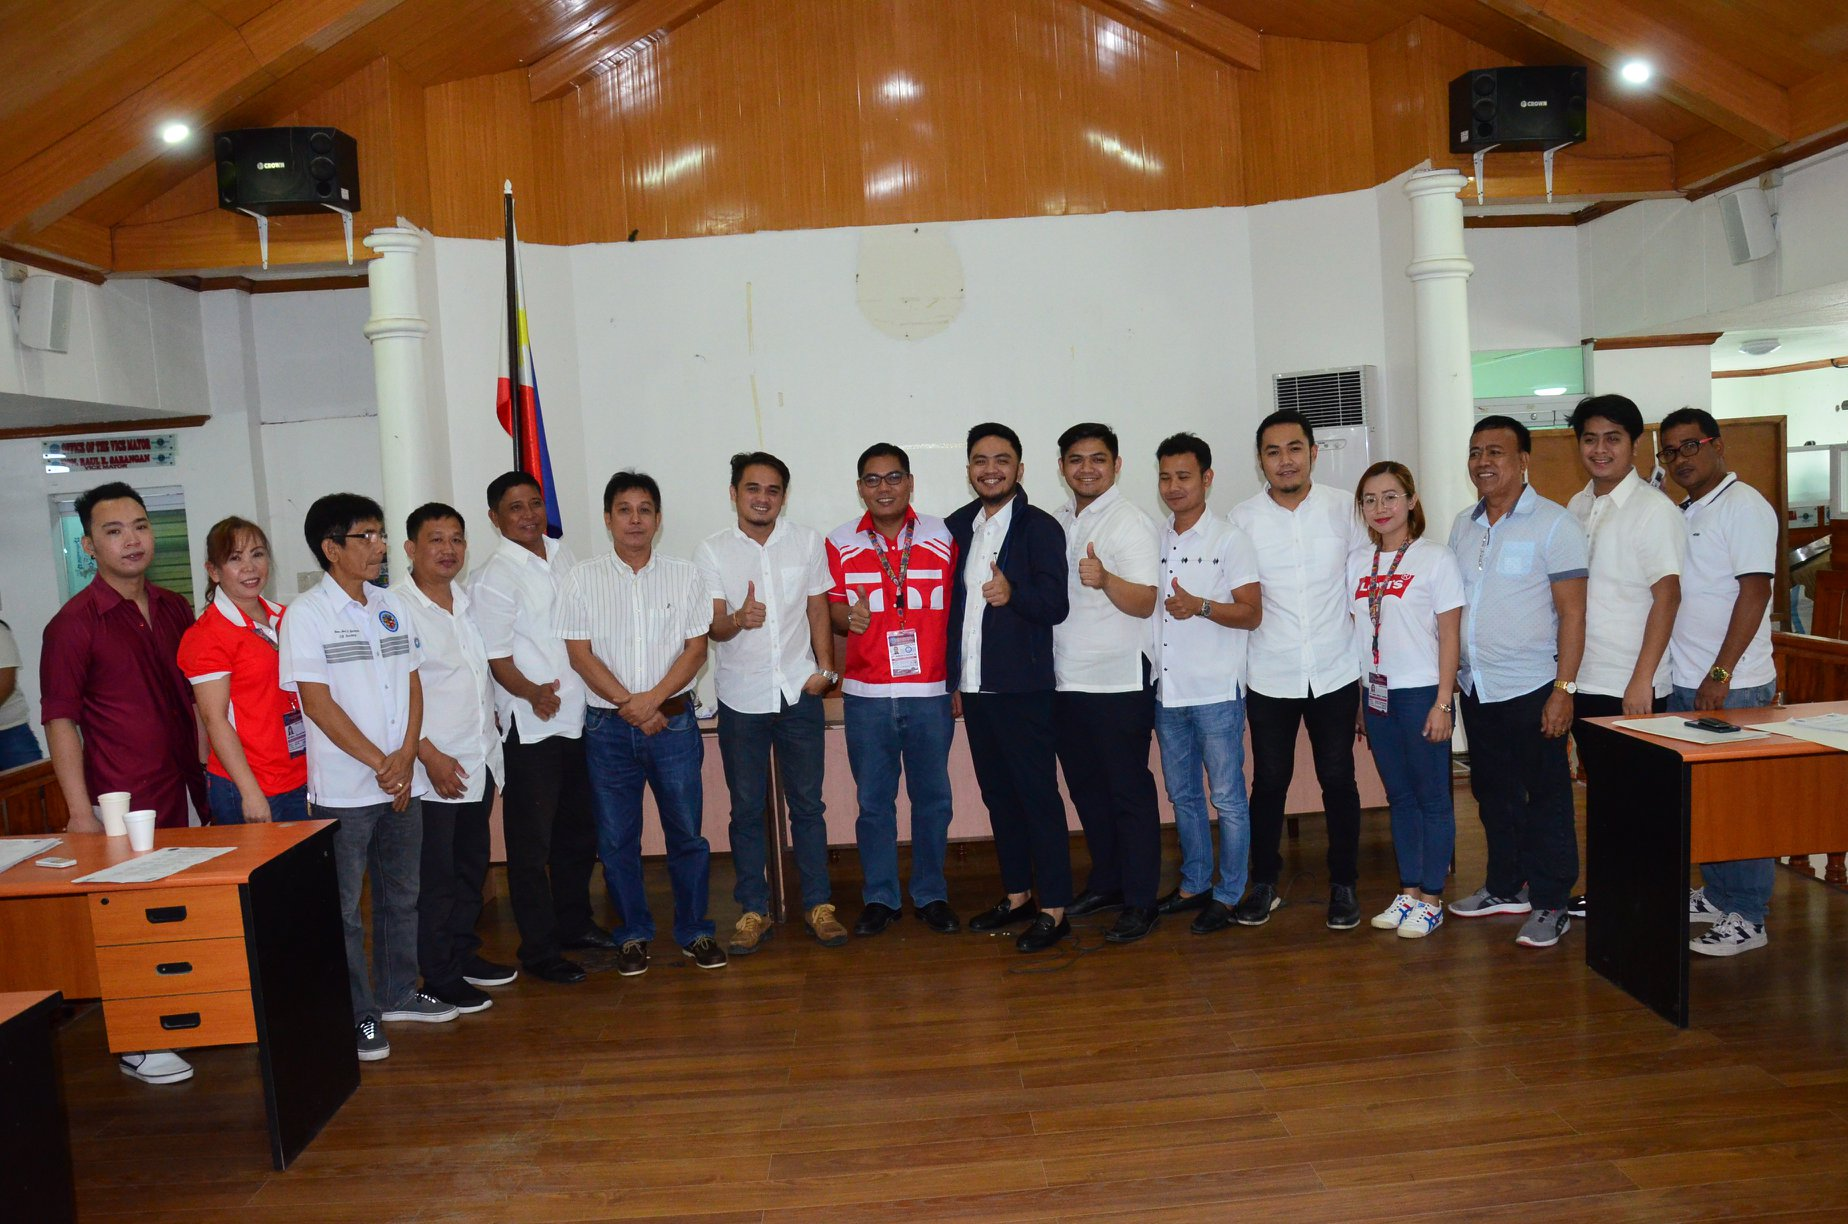 SB Confirms Atty. Bautista Anew as Municipal Administrator